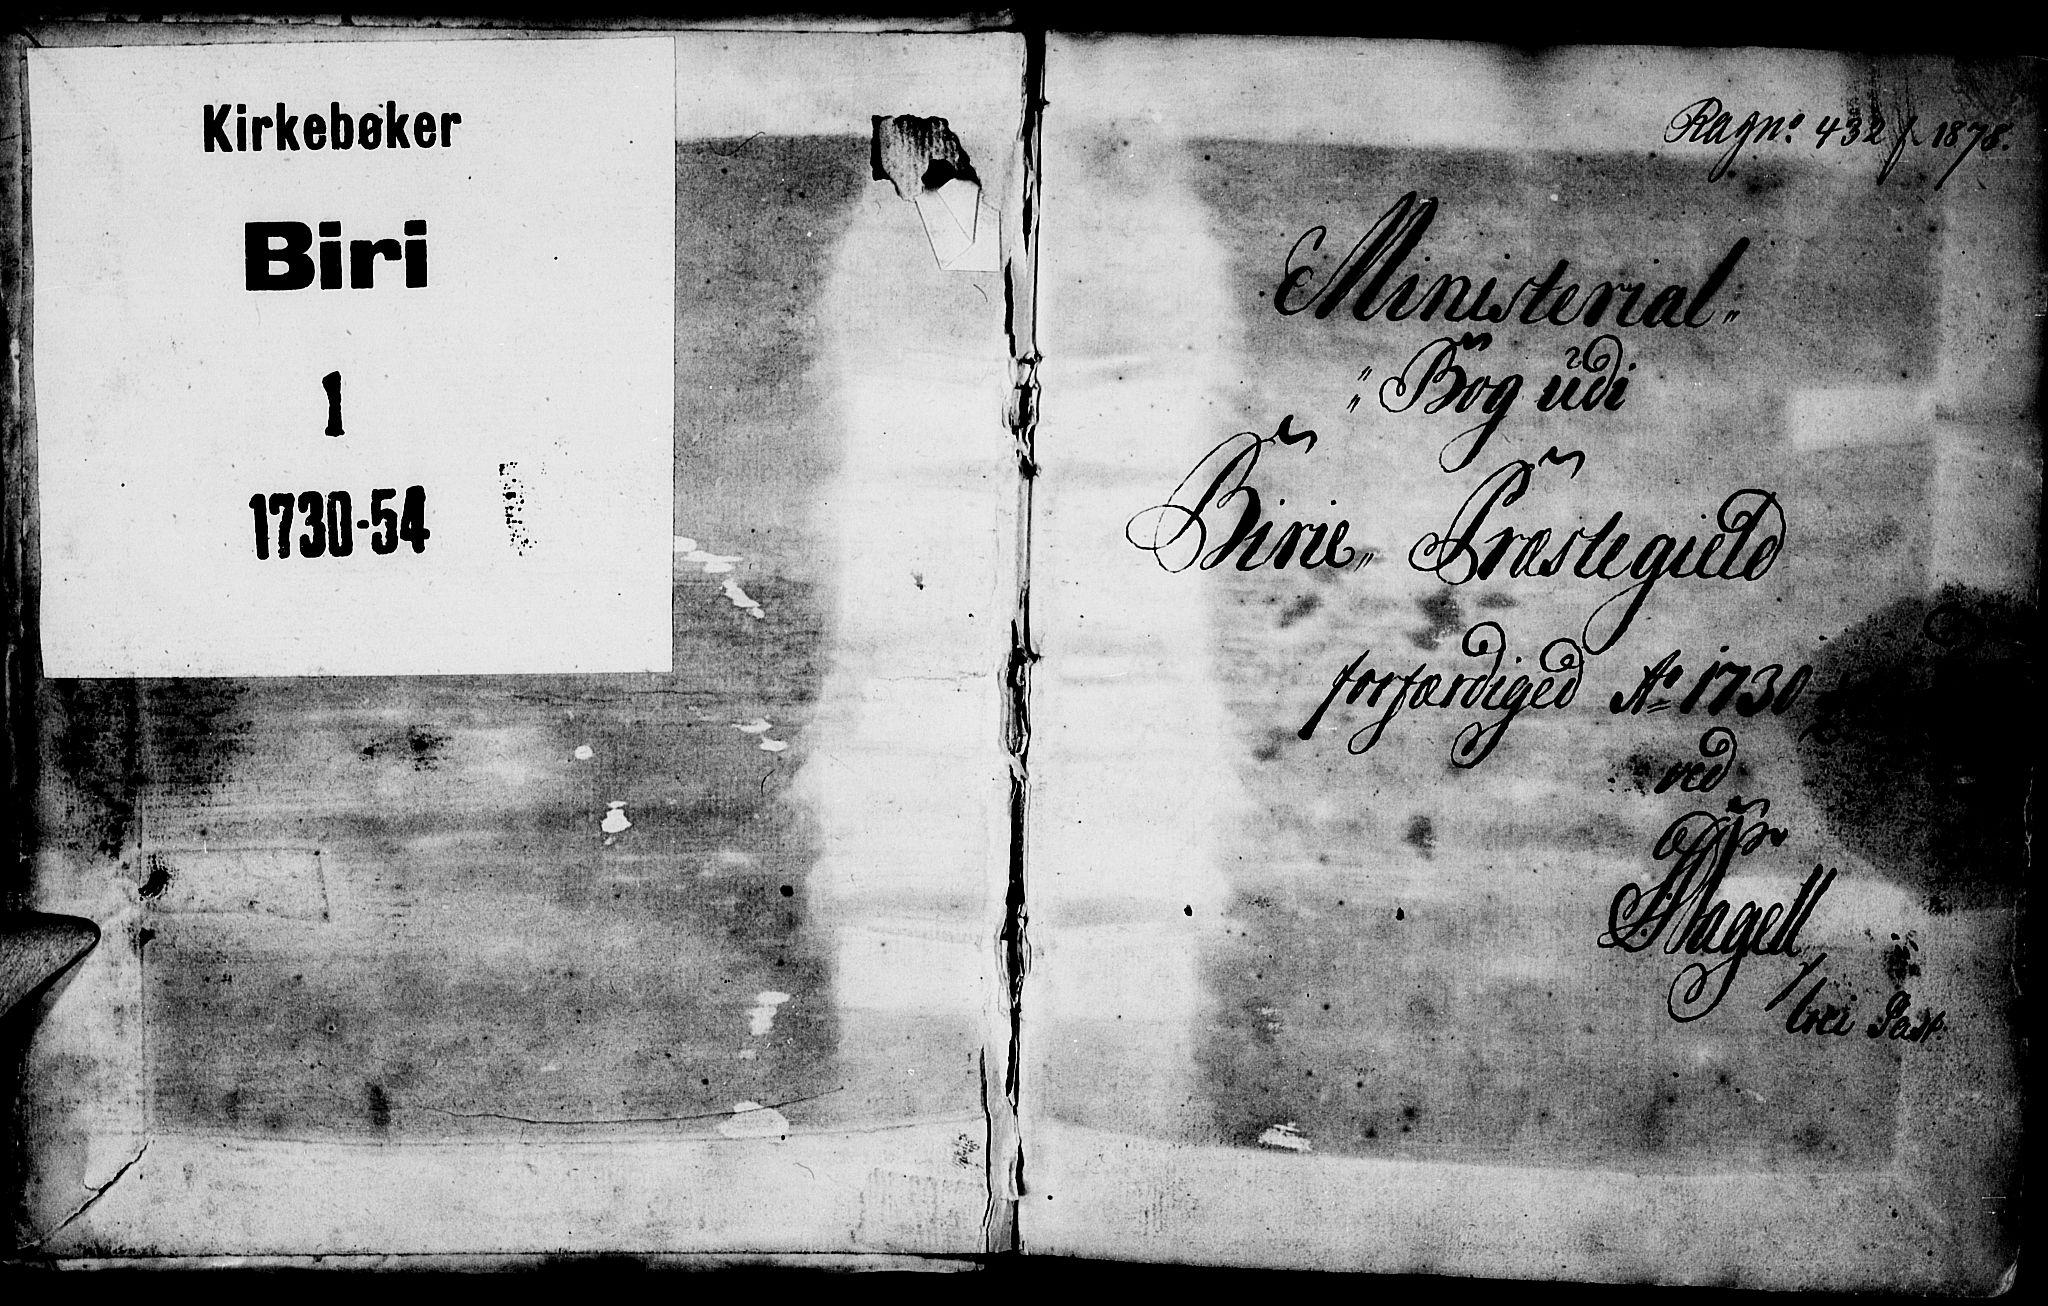 SAH, Biri prestekontor, Ministerialbok nr. 1, 1730-1754